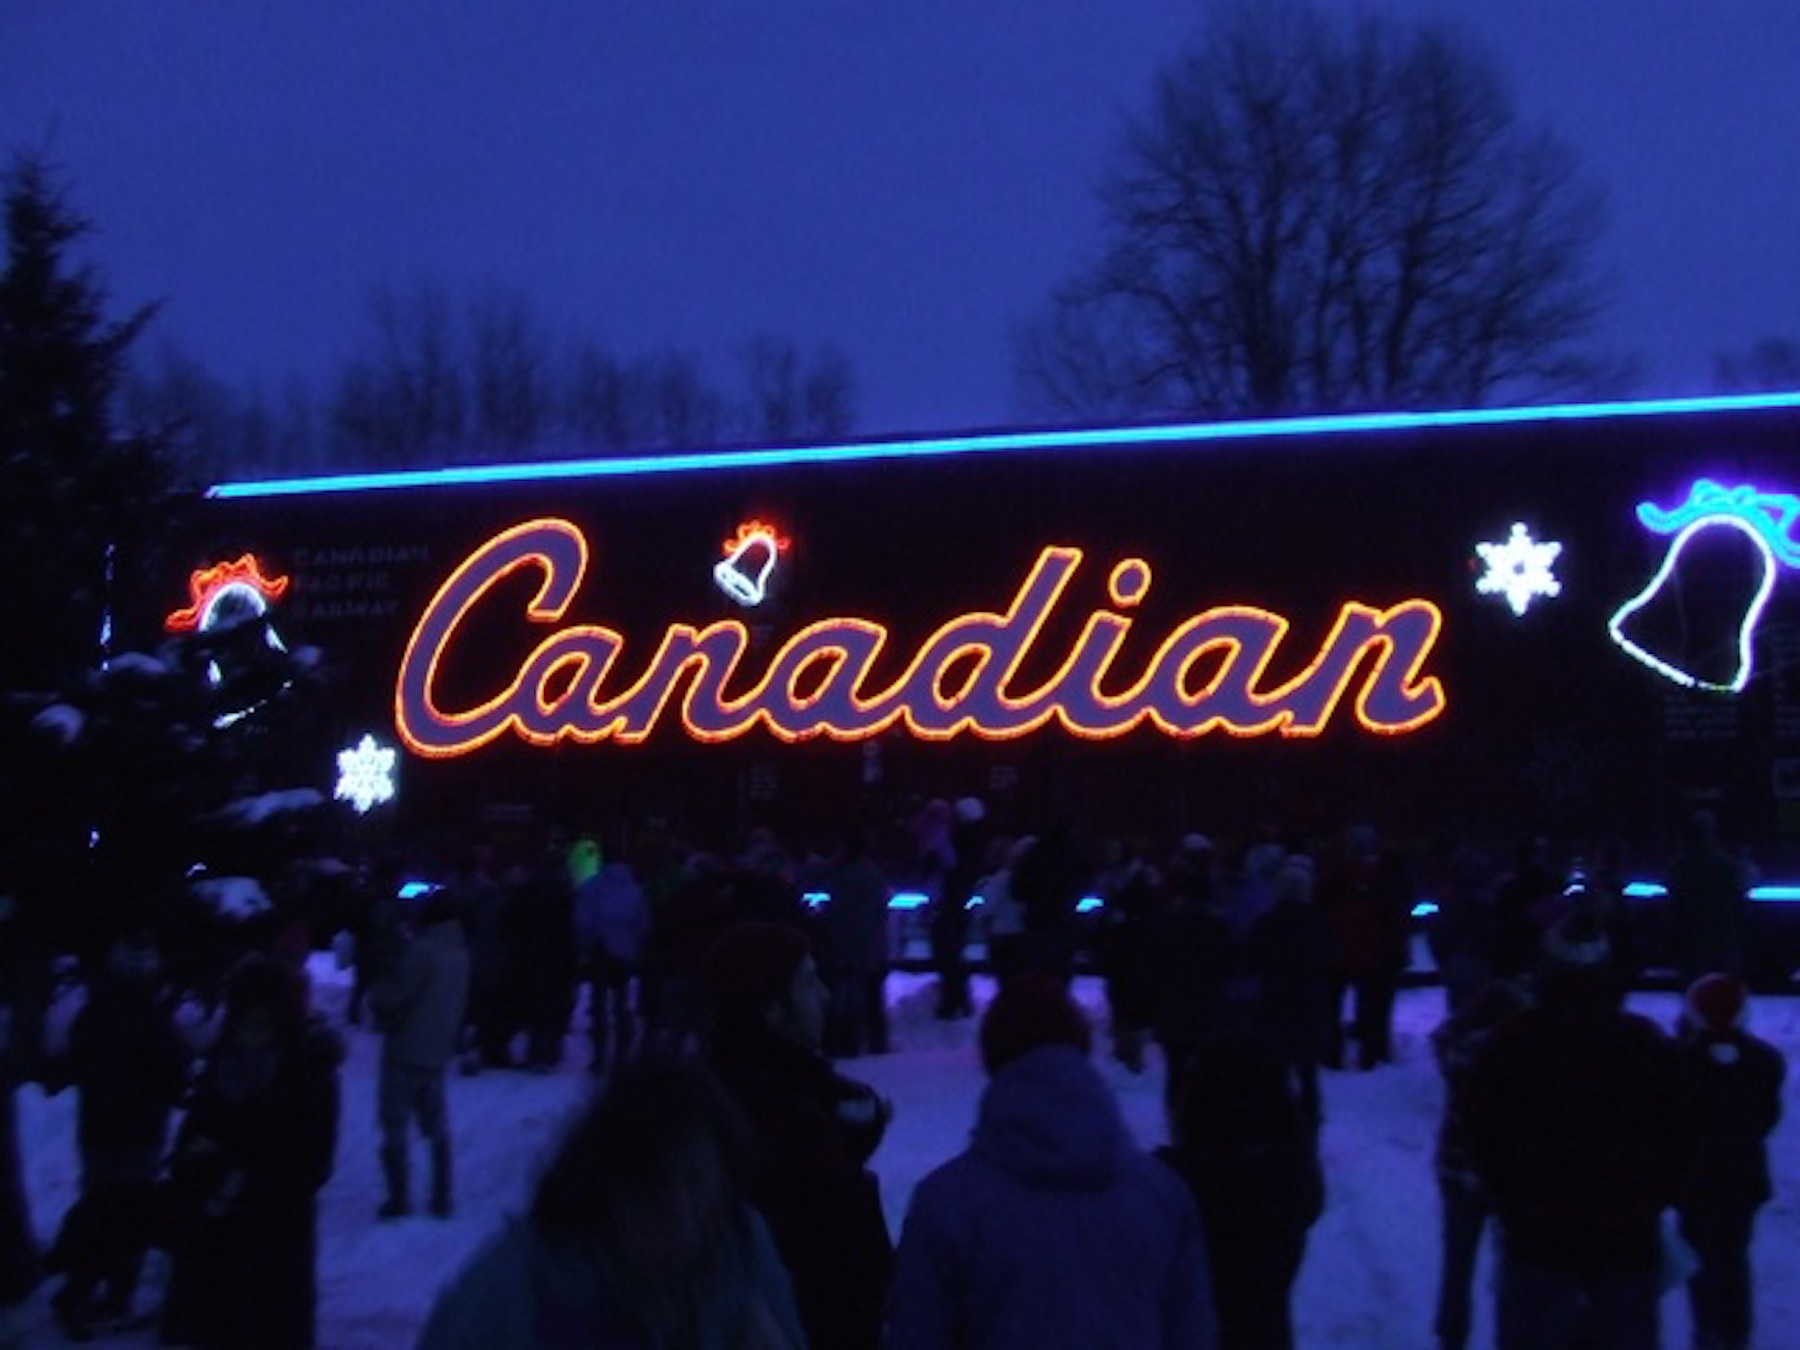 Canadian lights